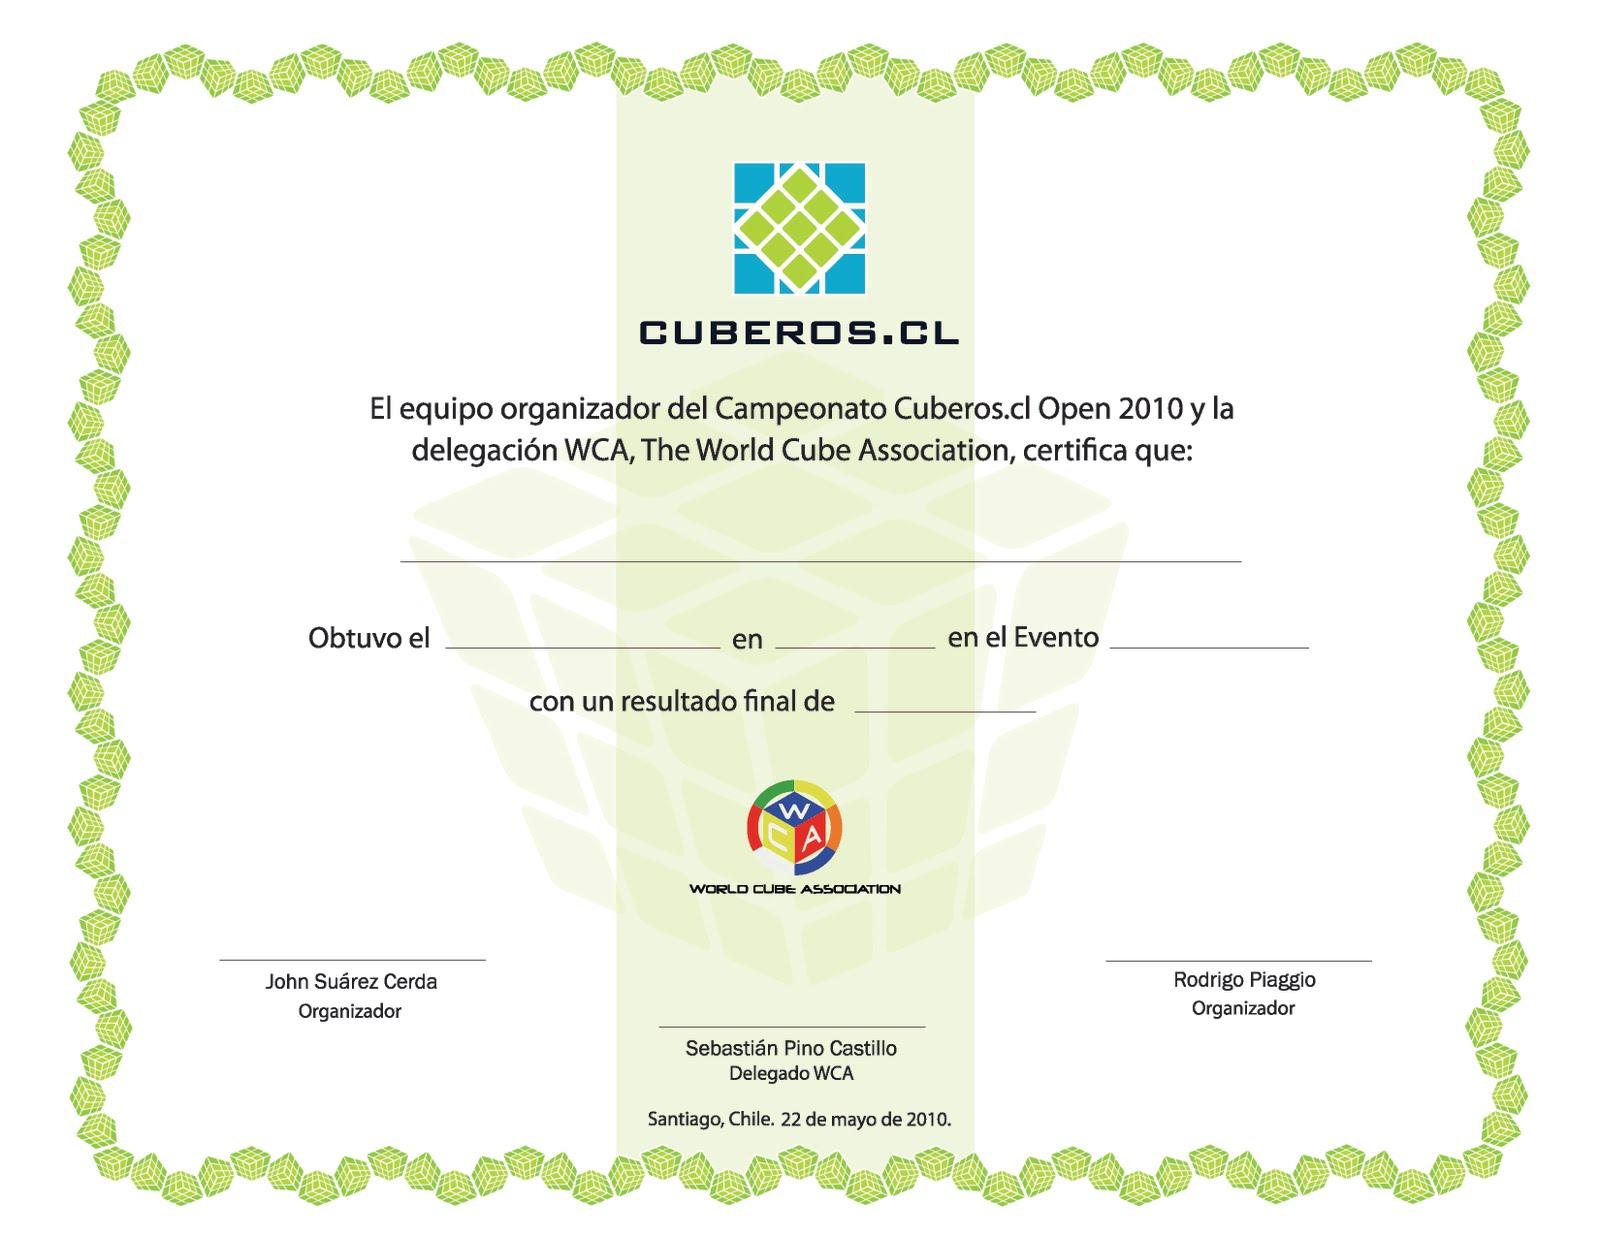 Dise  O De Diploma Para Evento Del 22 De Mayo De  Cuberos Cl